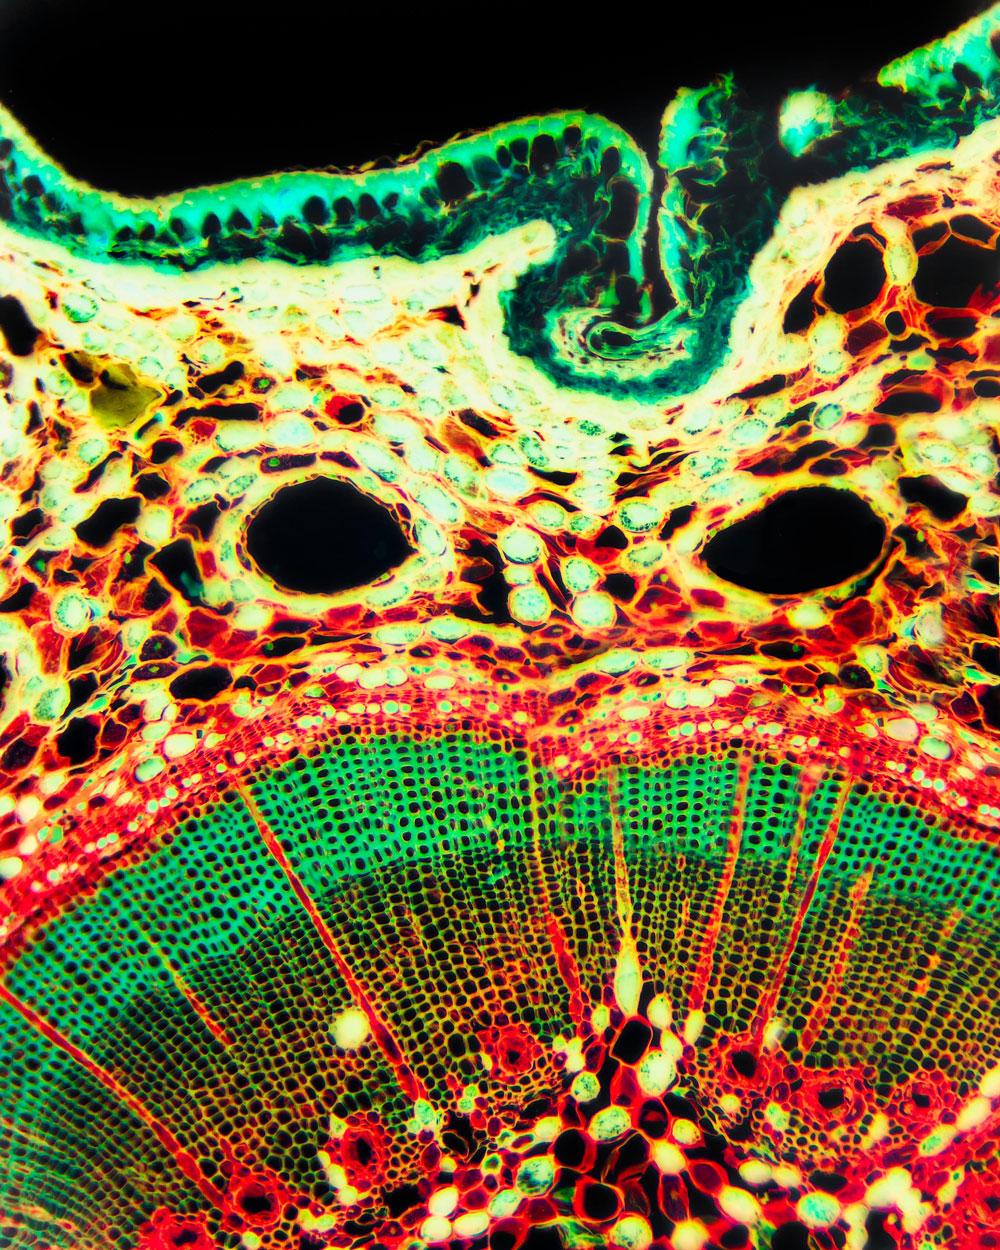 alexa-wright-microscope.jpg